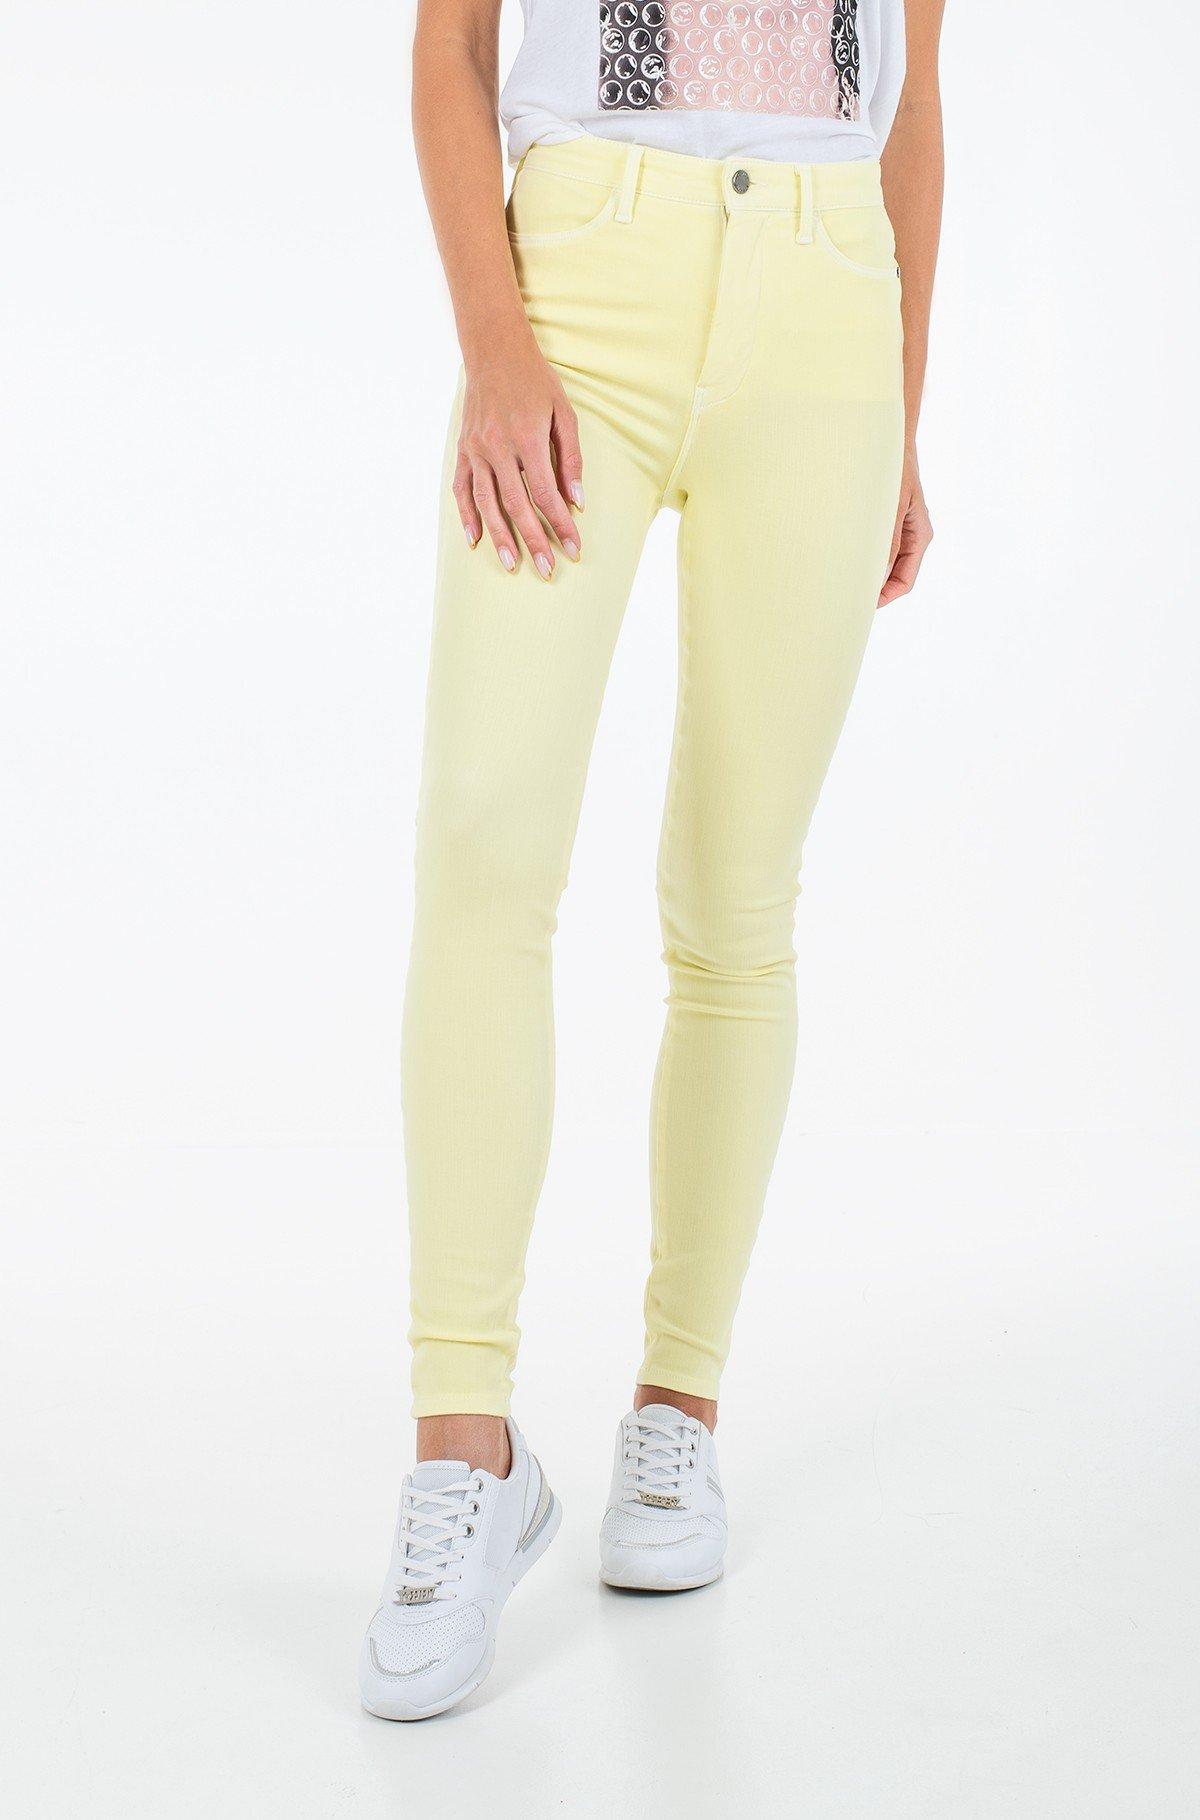 Jeans SCULPT U SKINNY HW ANKLE PANT-full-1